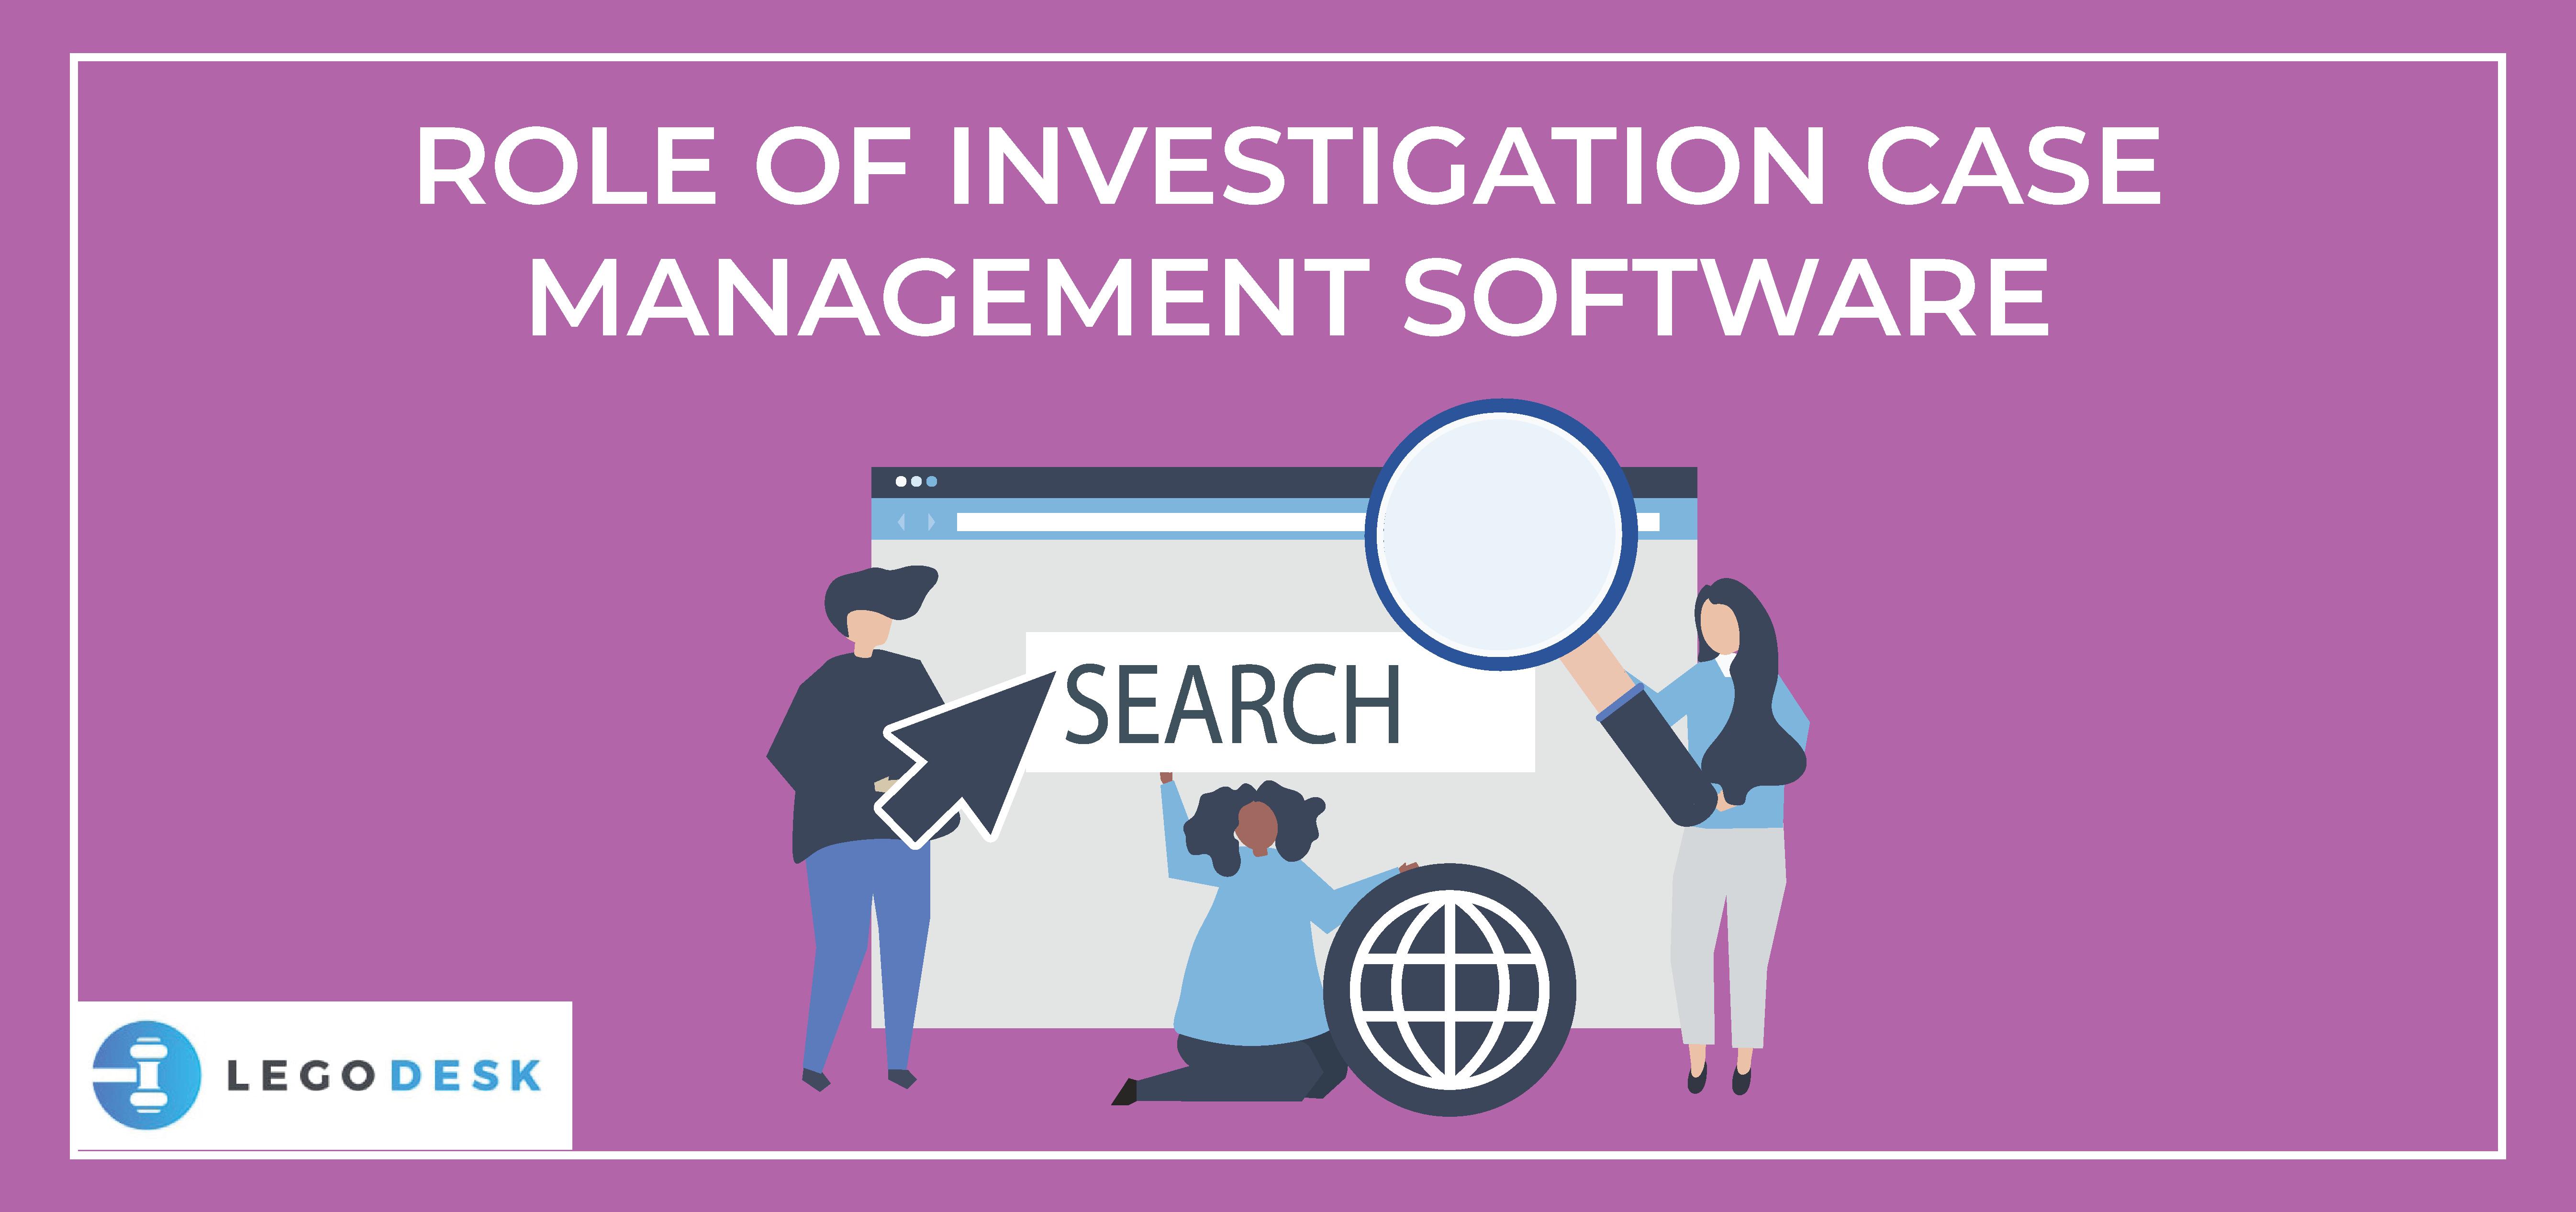 Role of Investigation Case Management Software